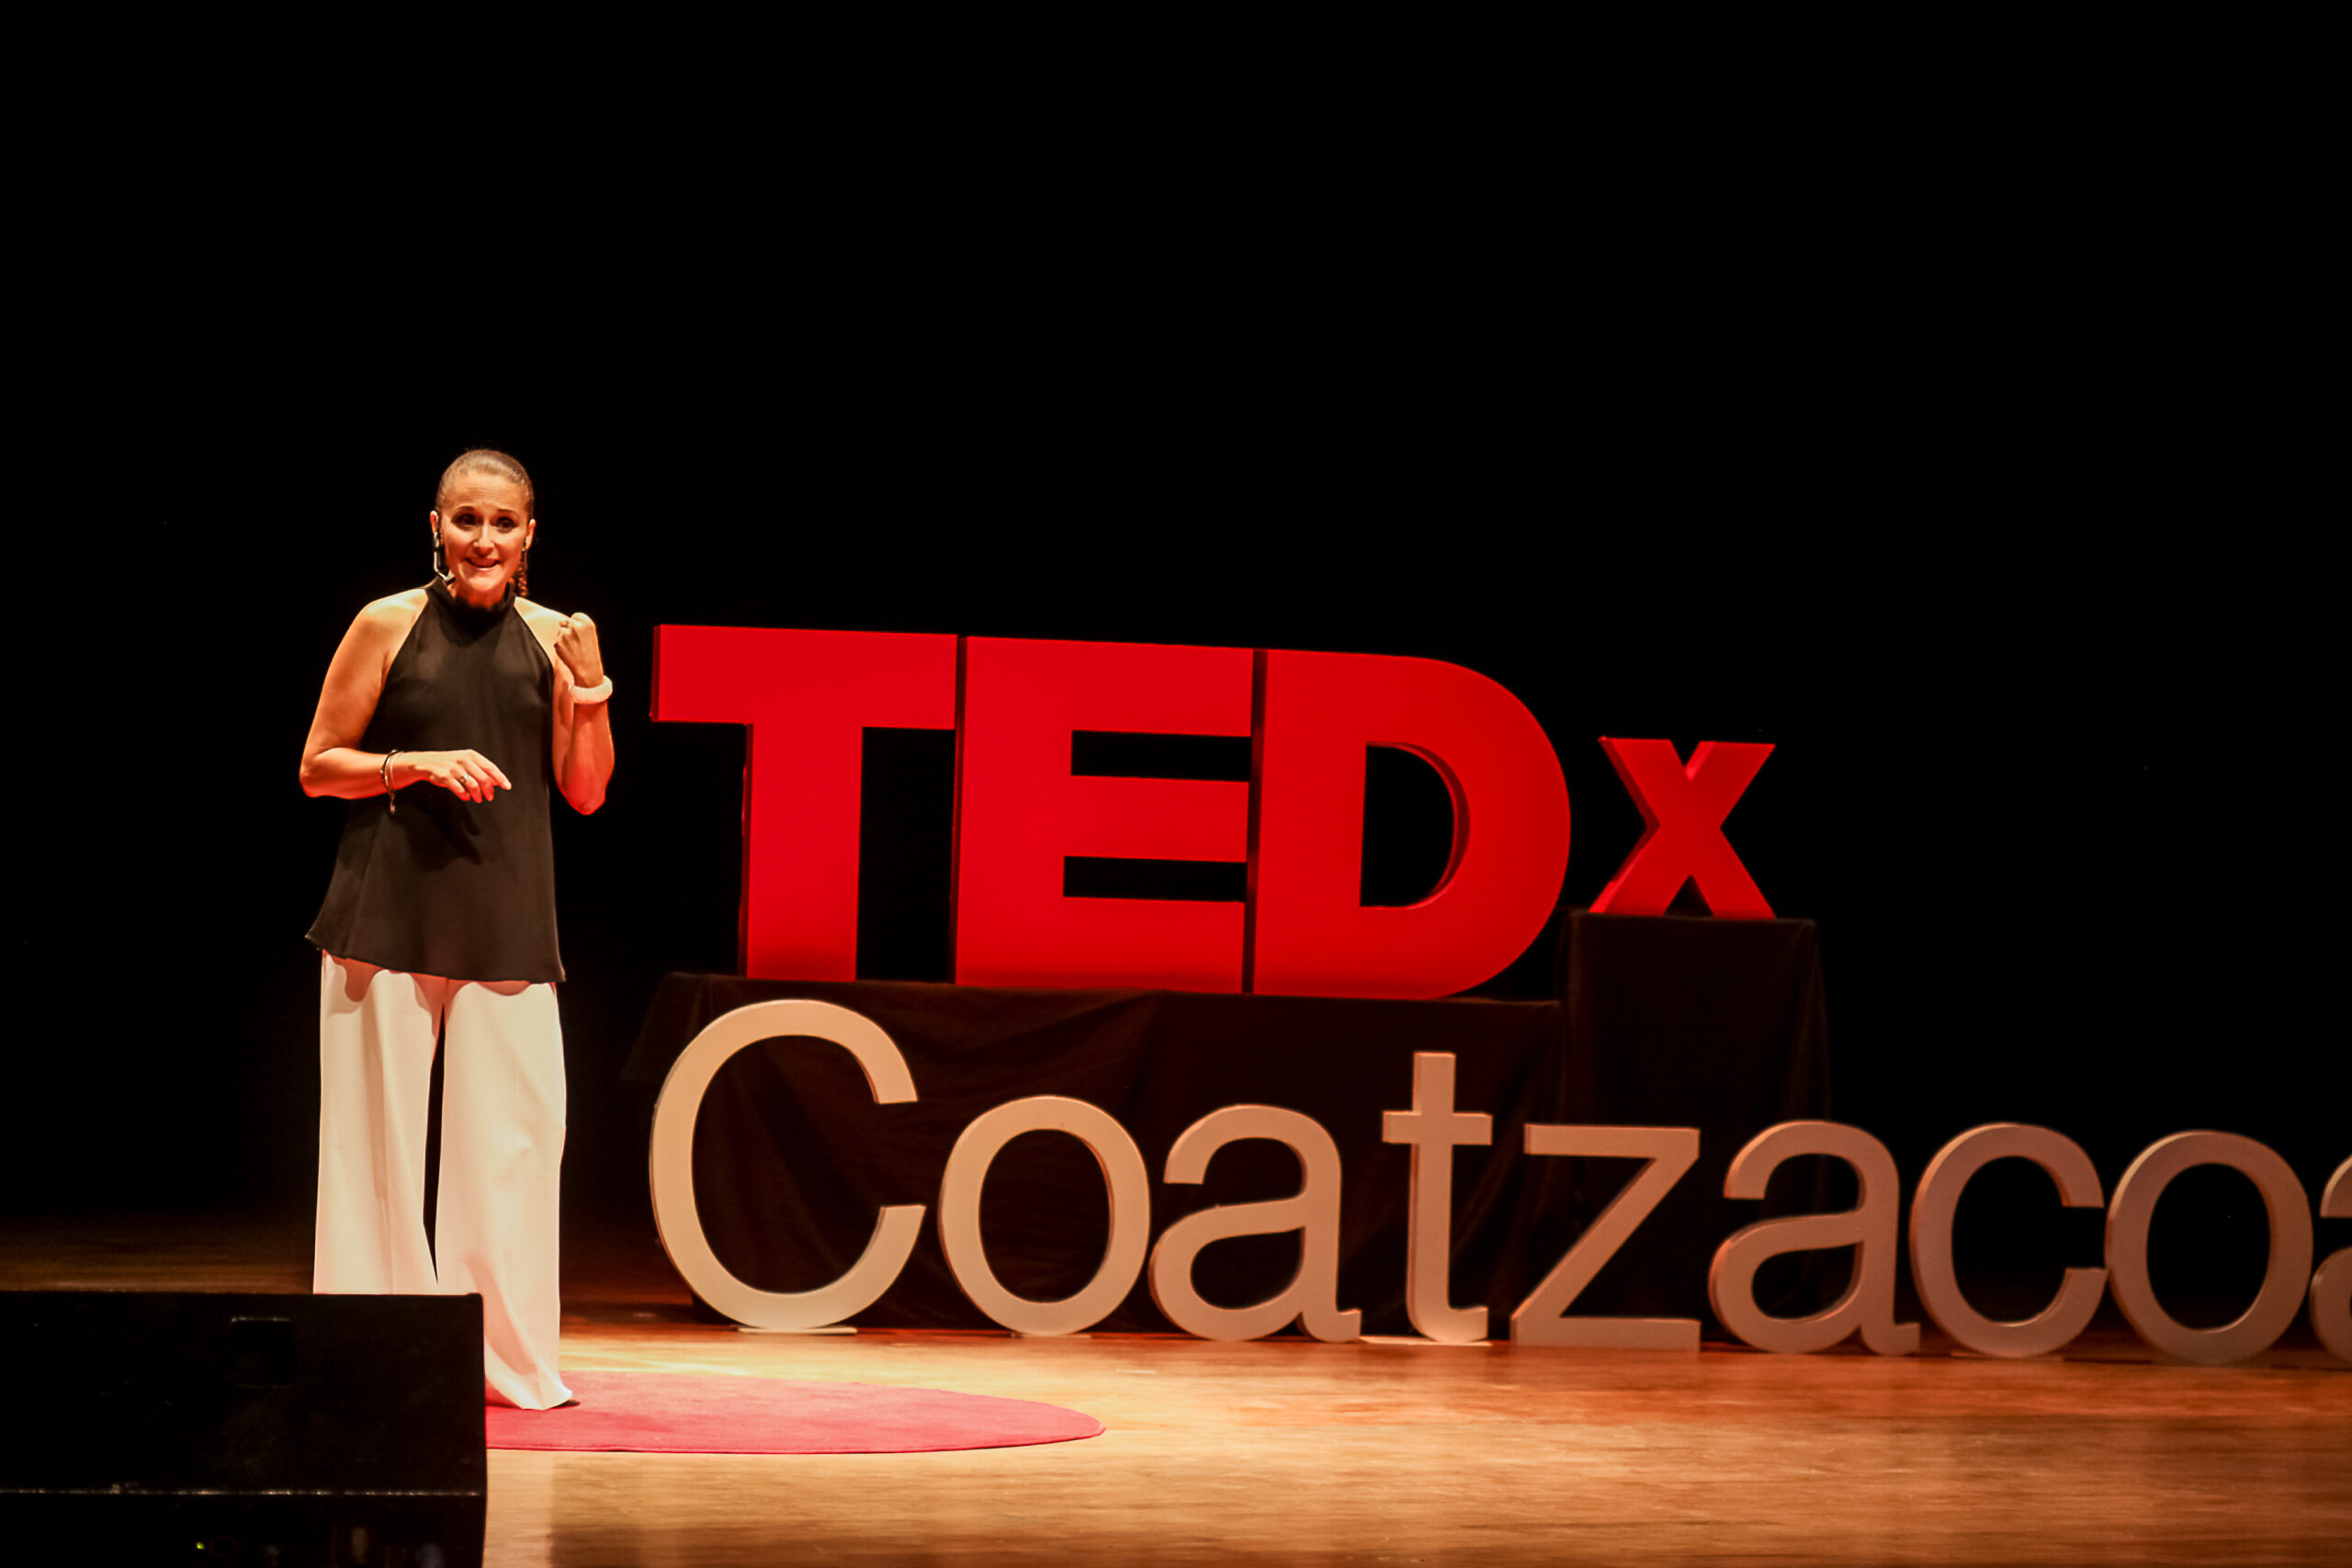 Sandy Mora en TEDx Coatzacoalcos